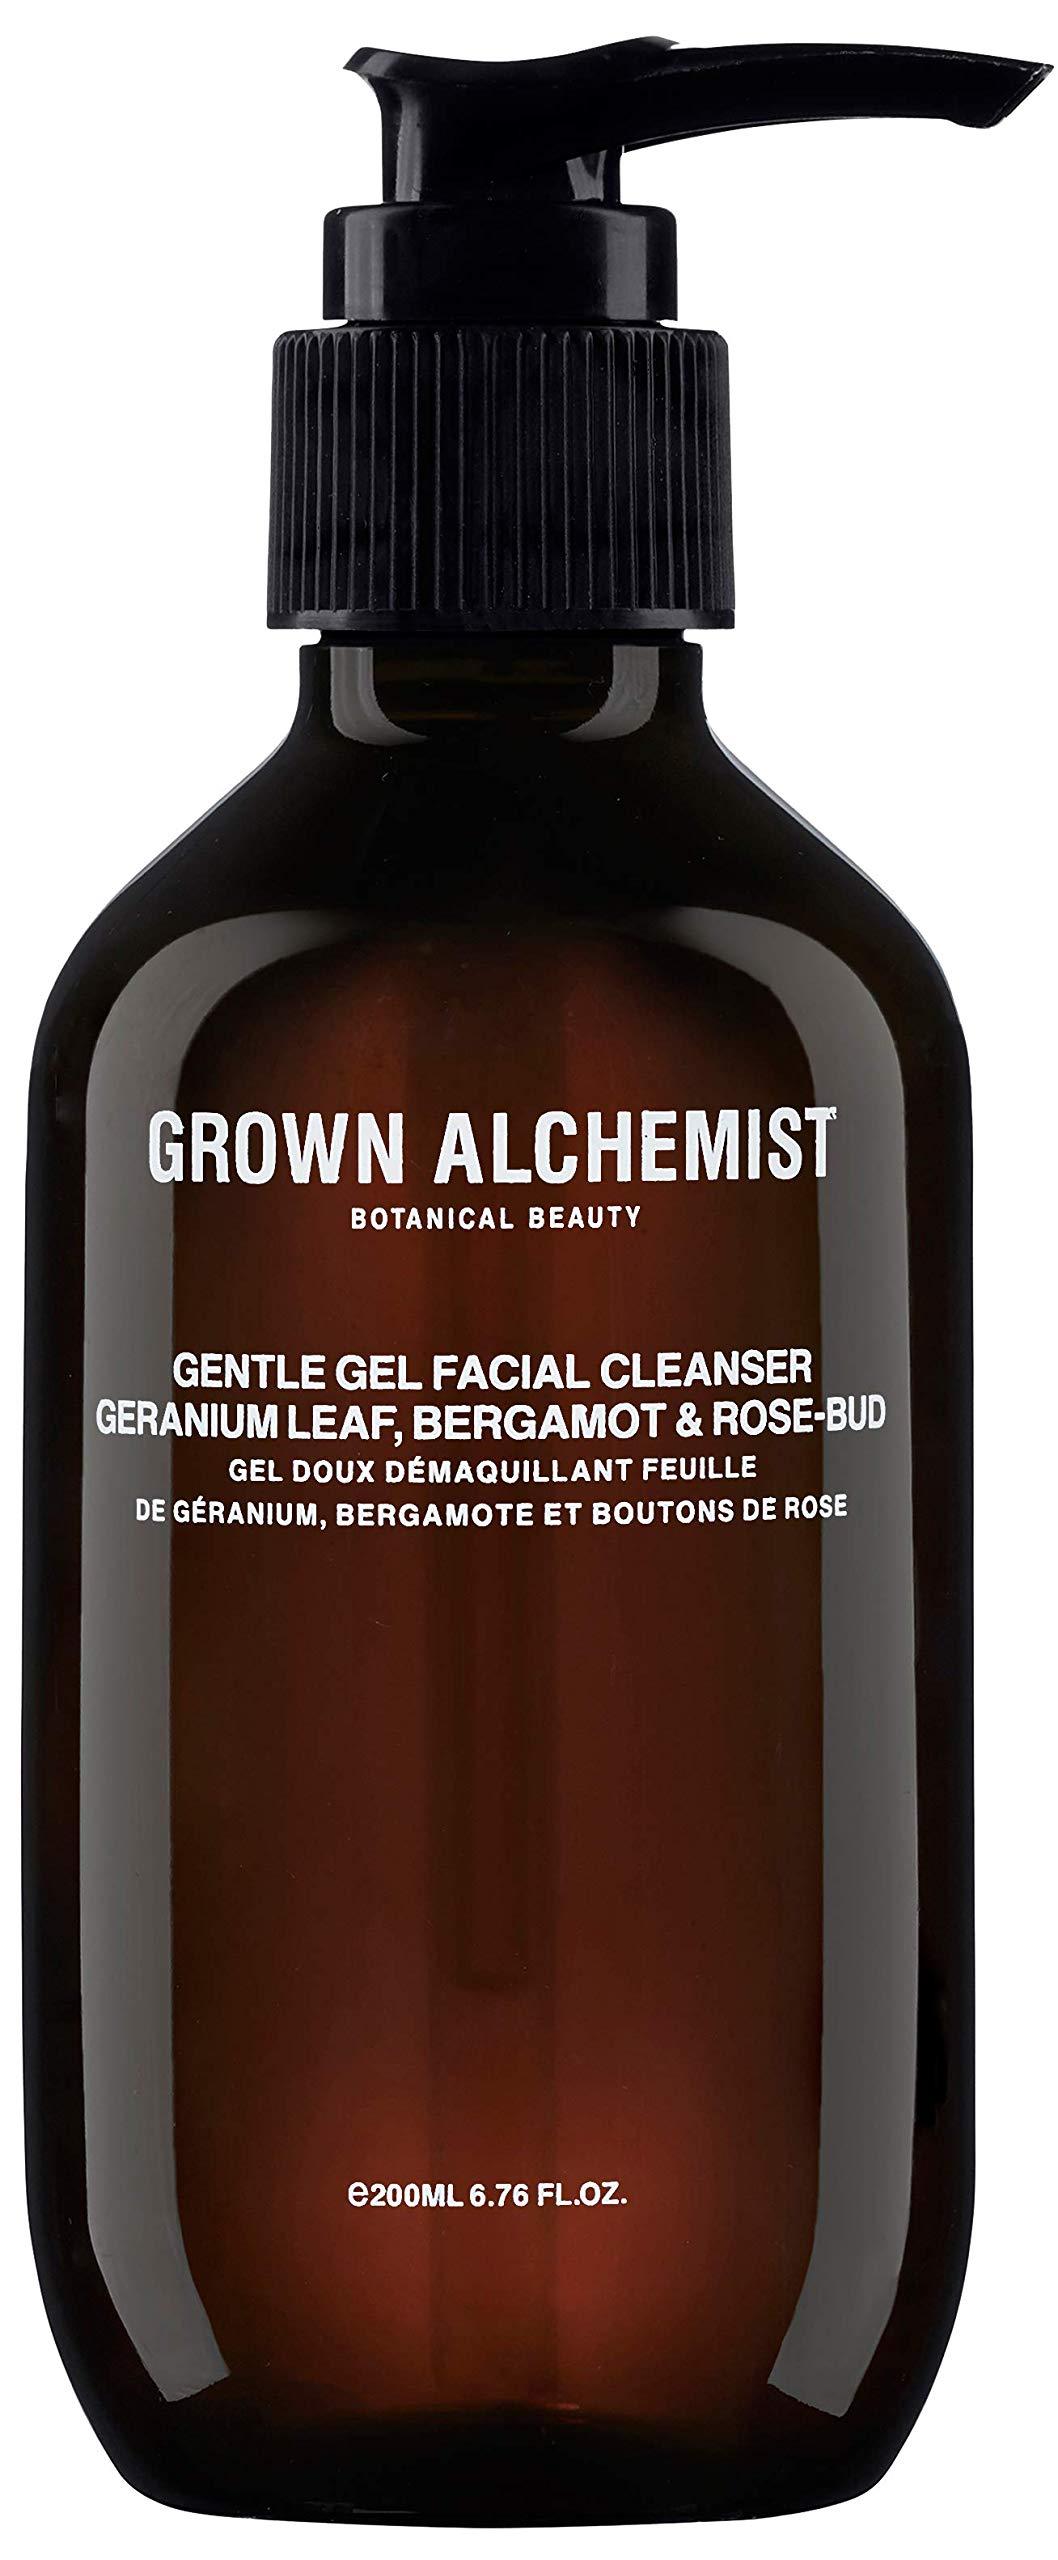 Grown Alchemist Gentle Gel Facial Cleanser - Geranium Leaf, Bergamot & Rose-Bud (200ml / 6.76oz)